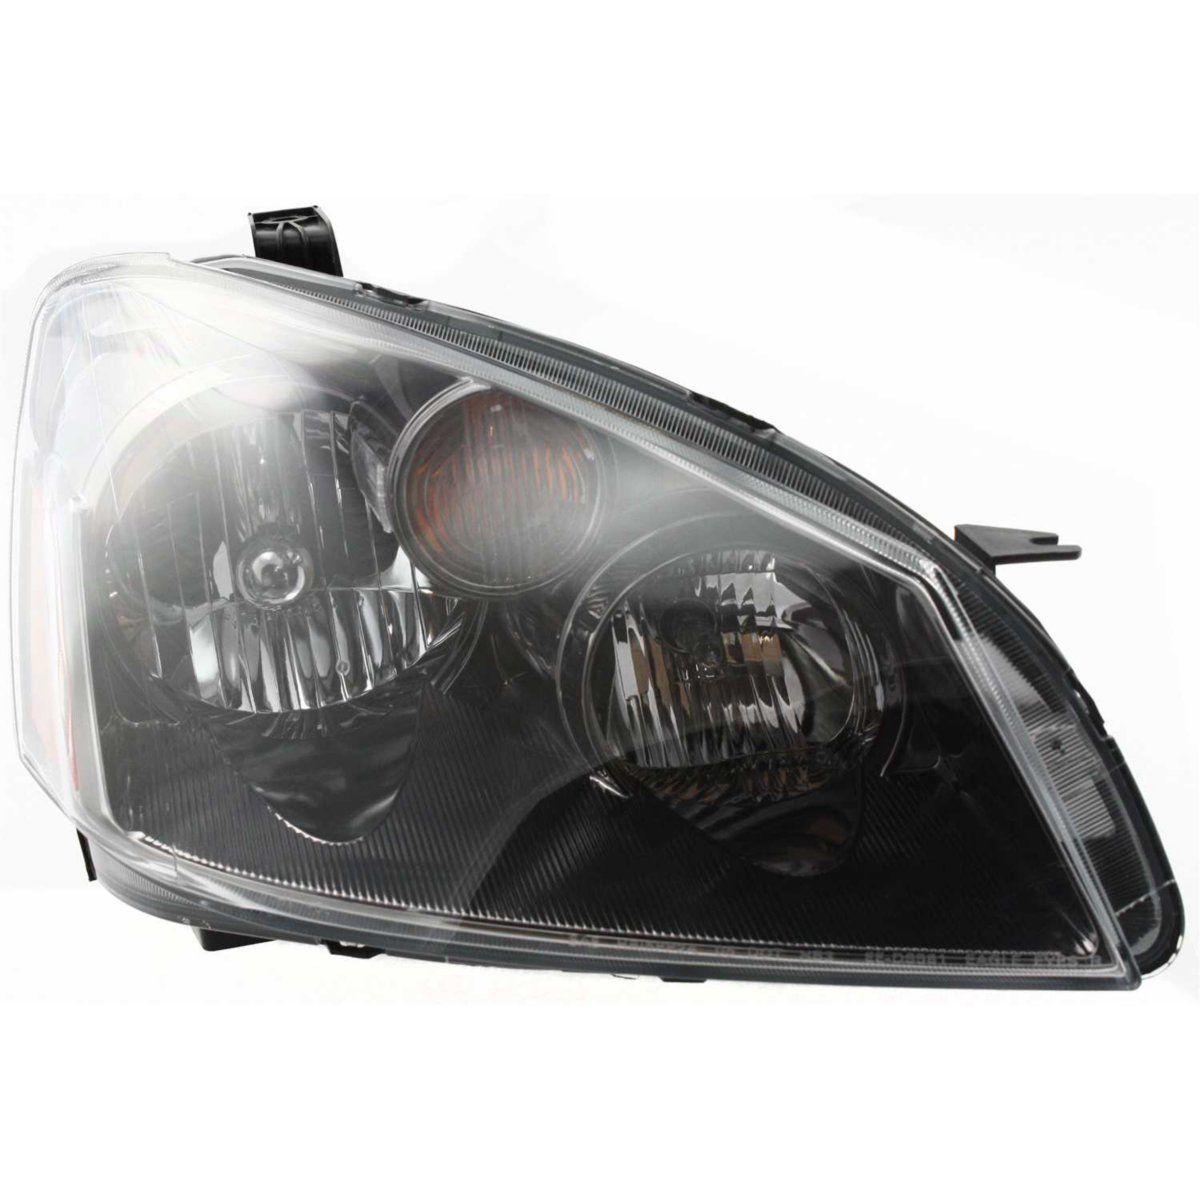 Headlight For 2005-2006 Nissan Altima Passenger Side w ...